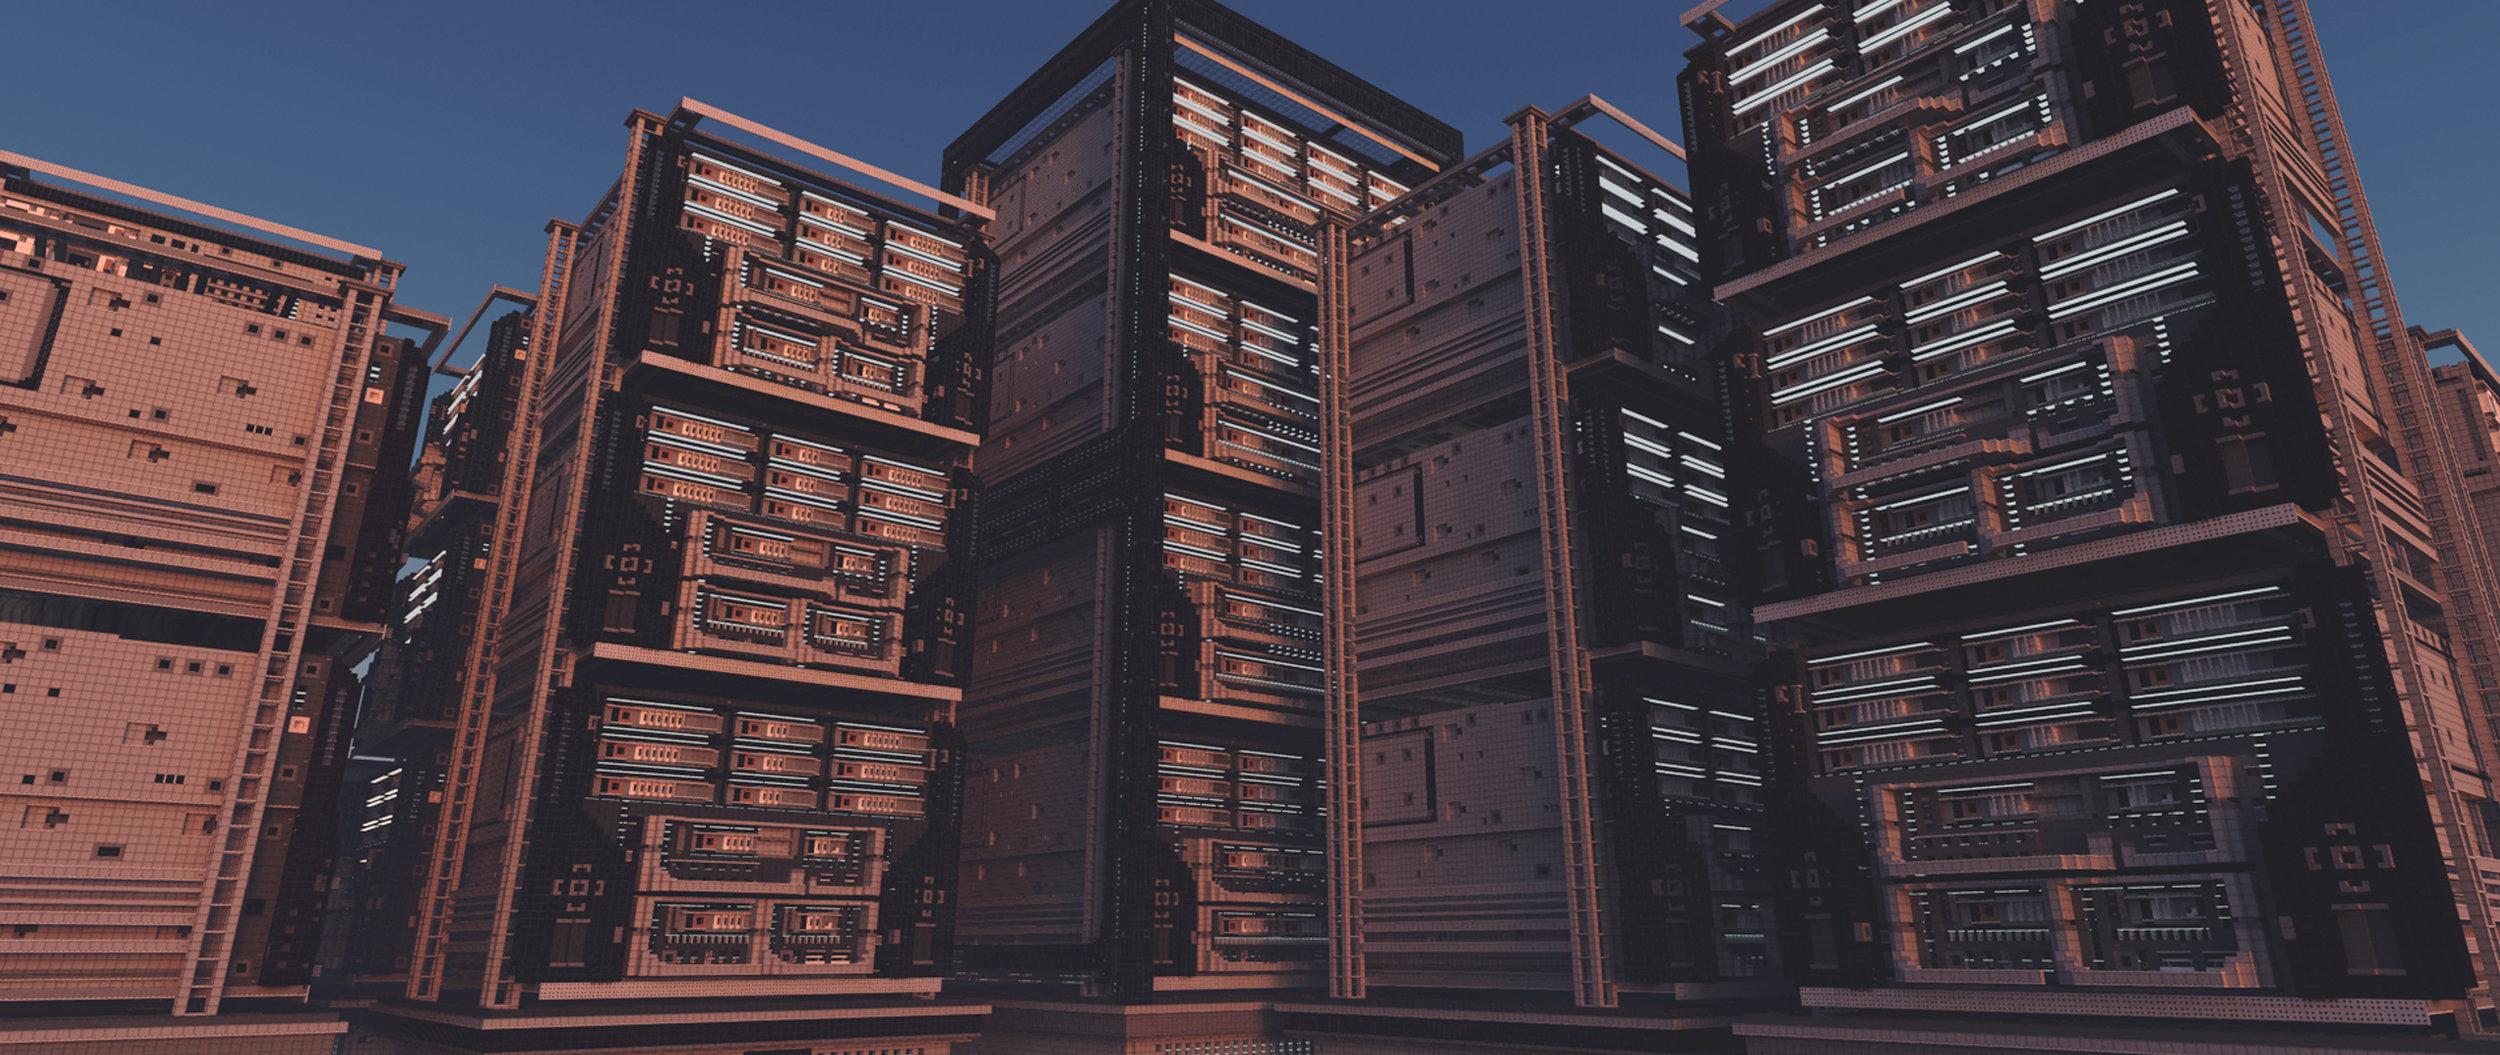 ServerCraft - Dell EMC